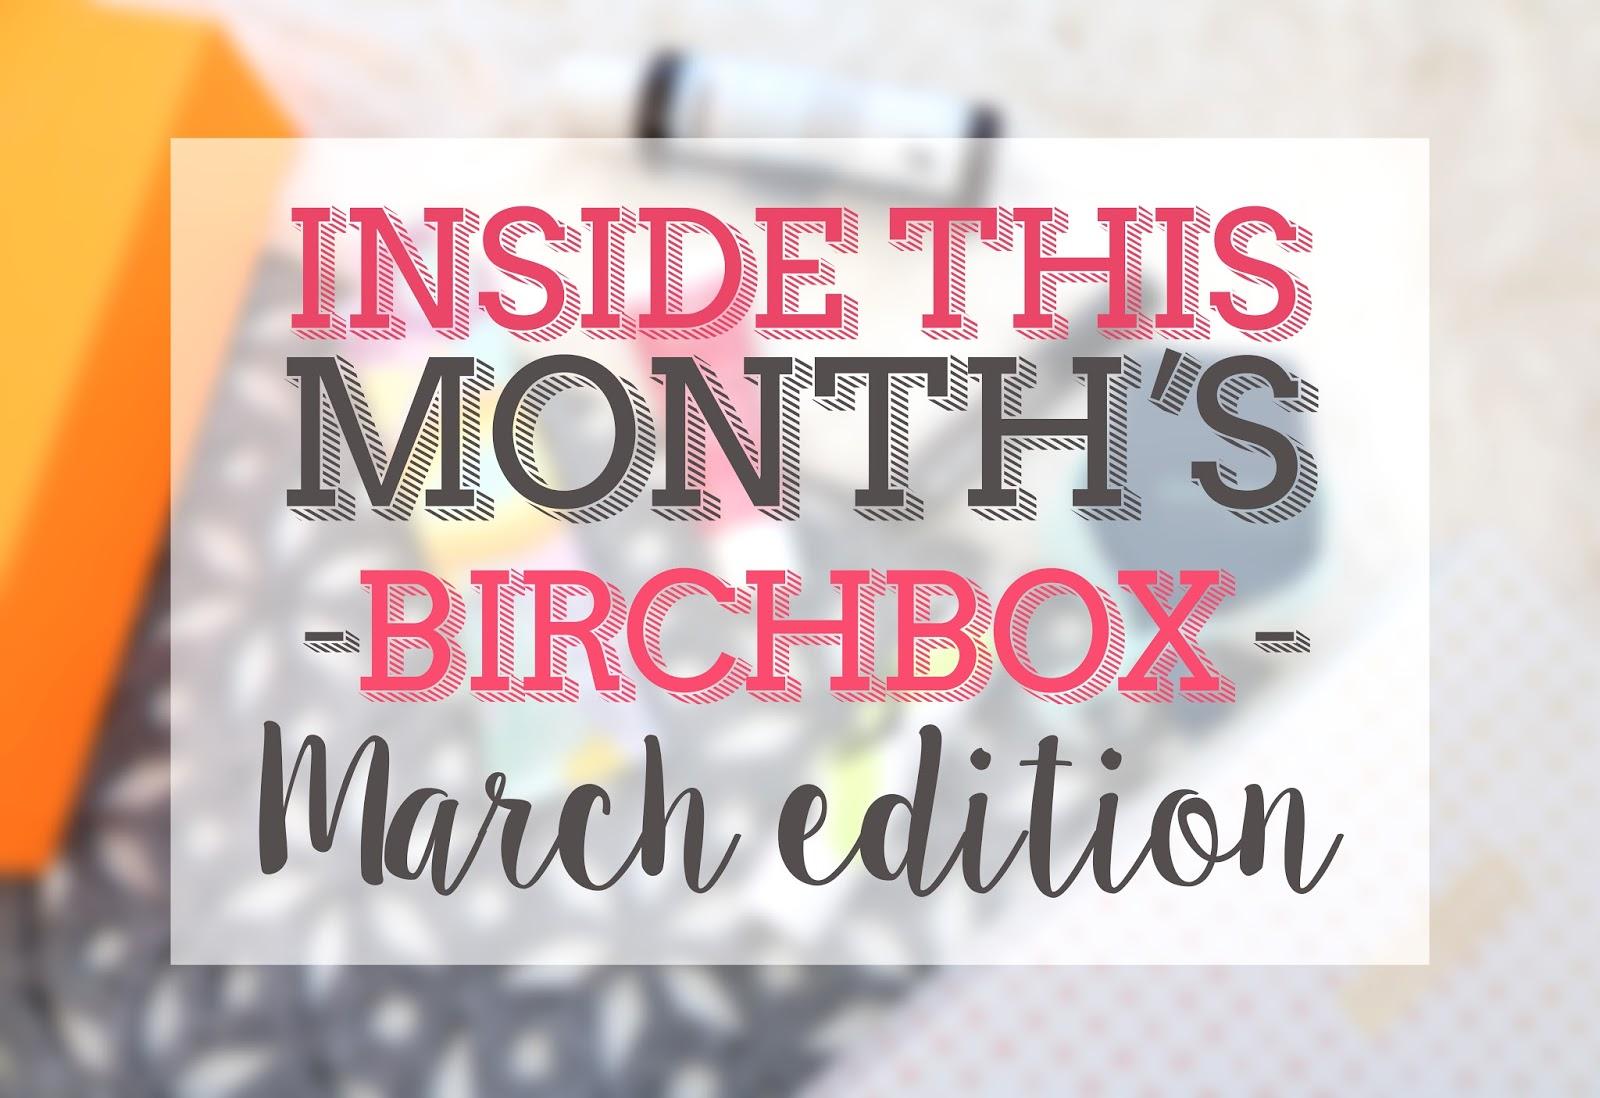 Birchbox March 2016